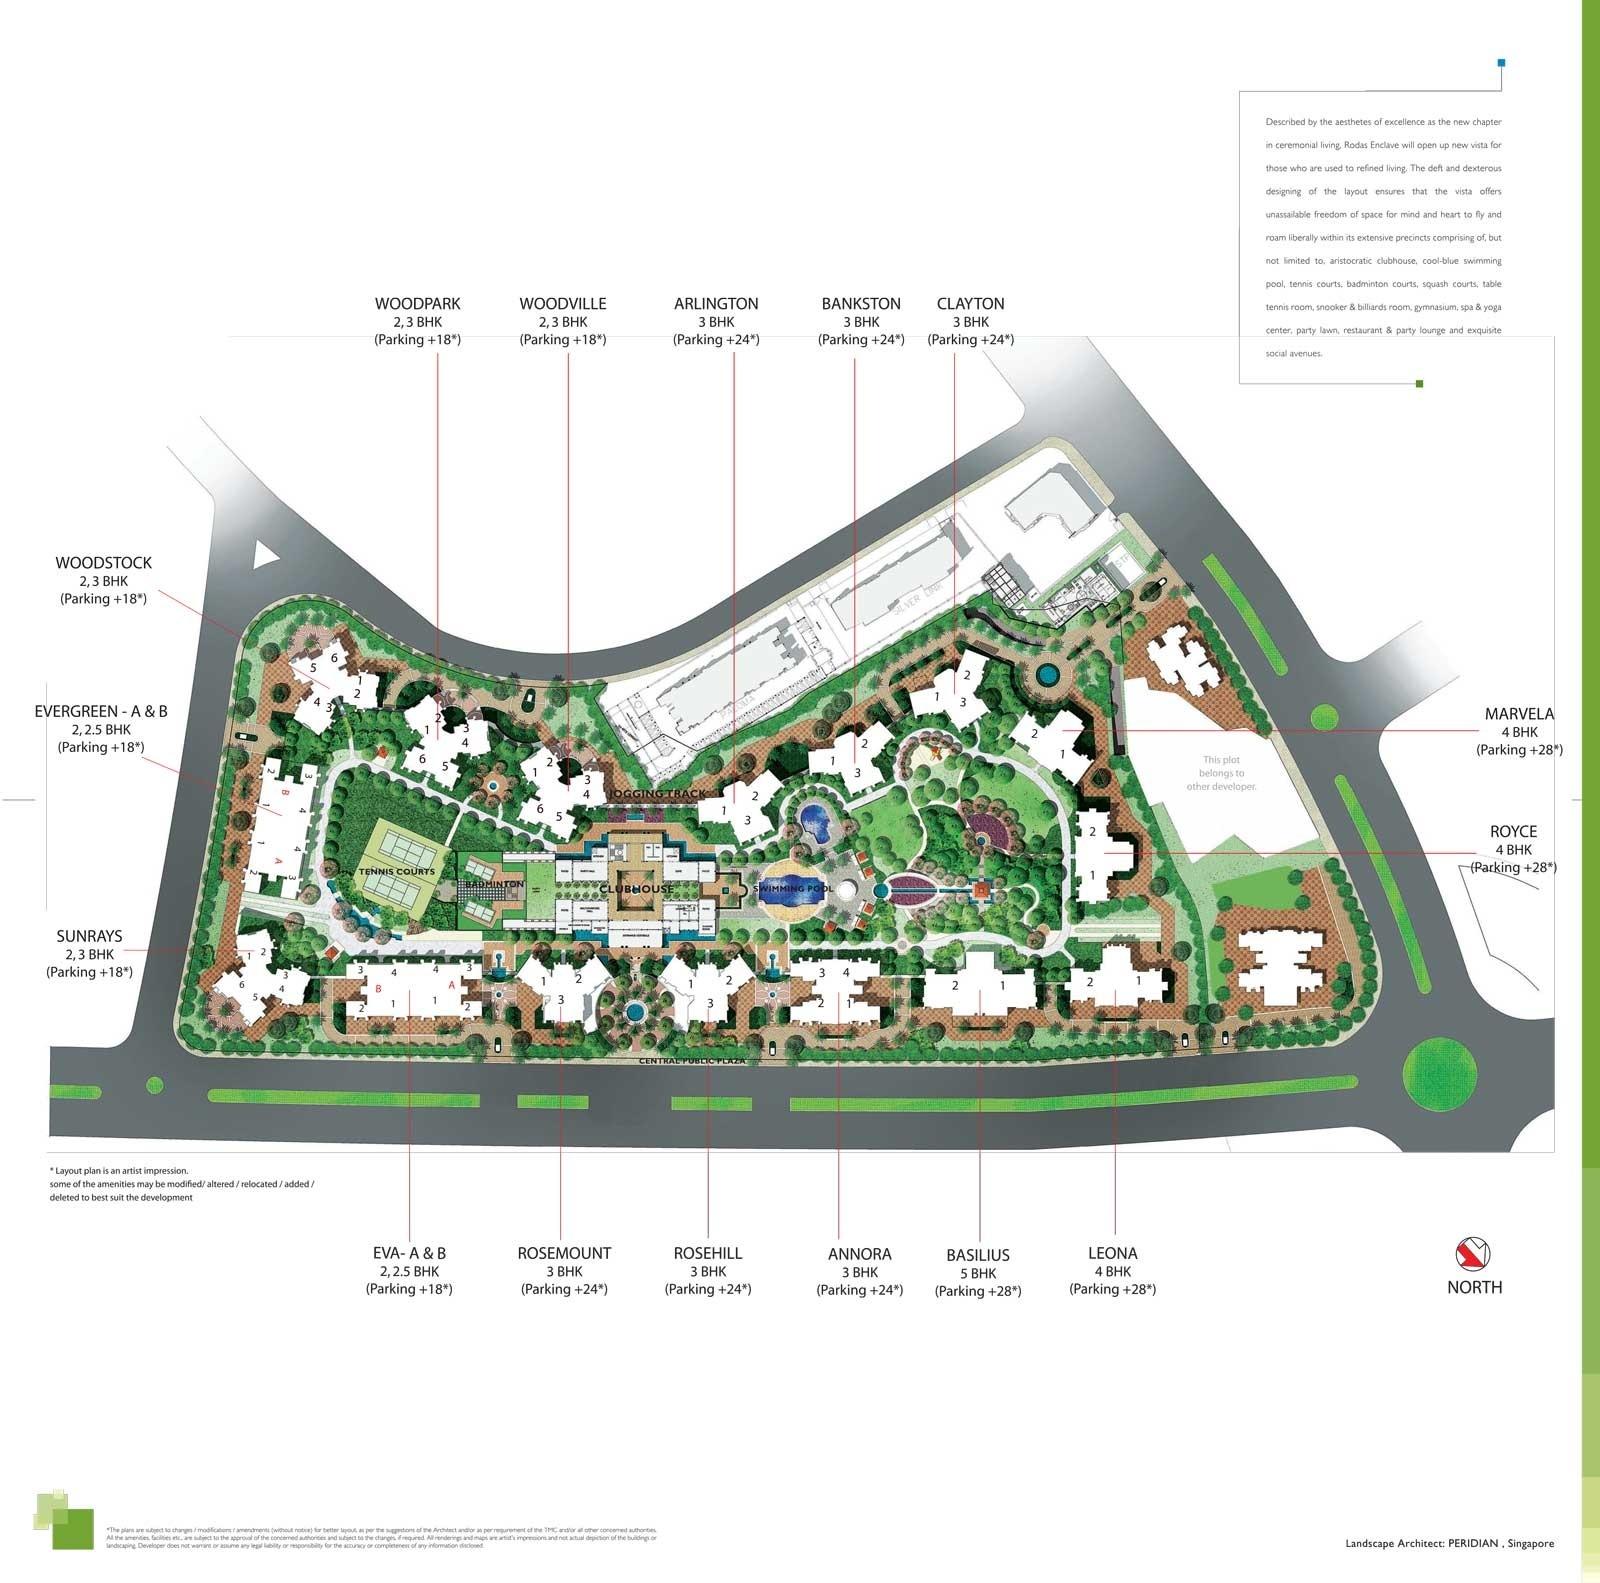 hiranandani basilius project master plan image1